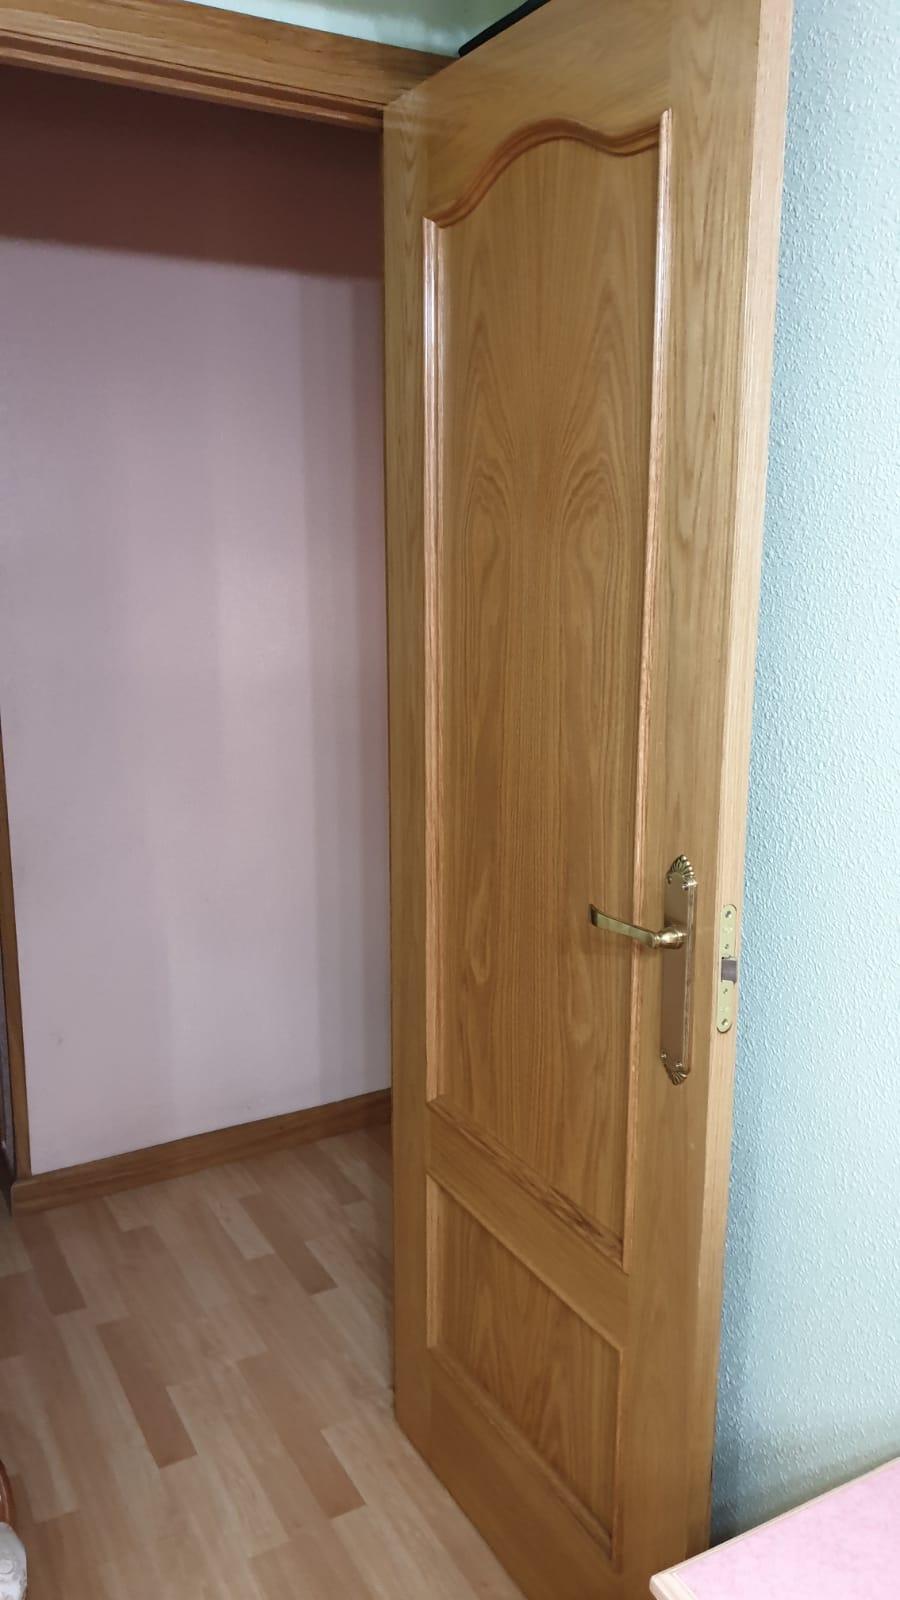 Piso de tres dormitorios junto a corte inglés (REF: 26) - foto 8 2848721b-bbb2-4ce7-b81e-627055075936.jpg